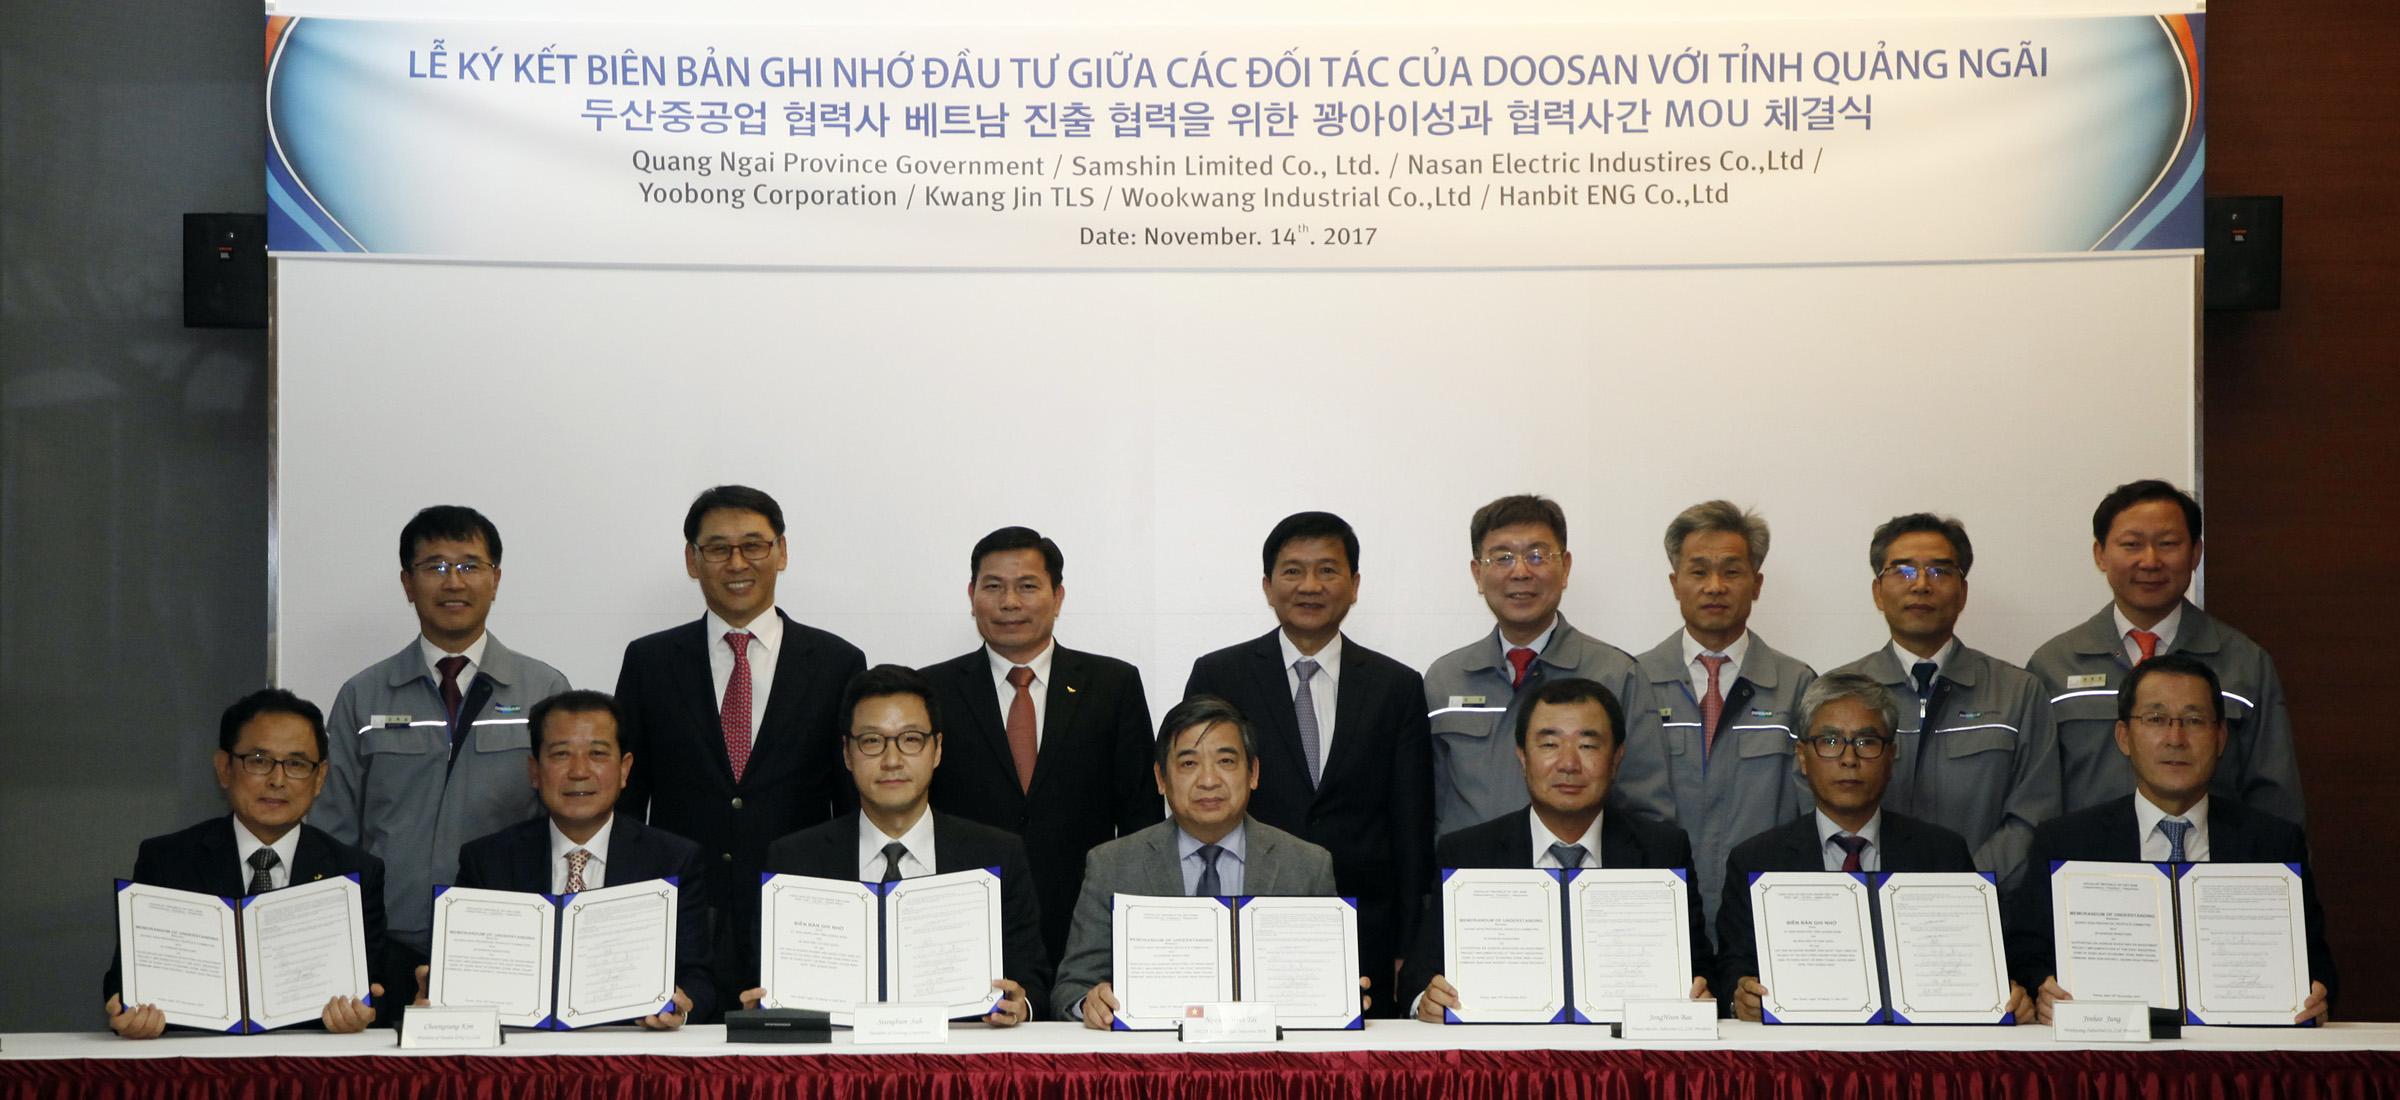 dung quat ez finds fruitful partnership in korea